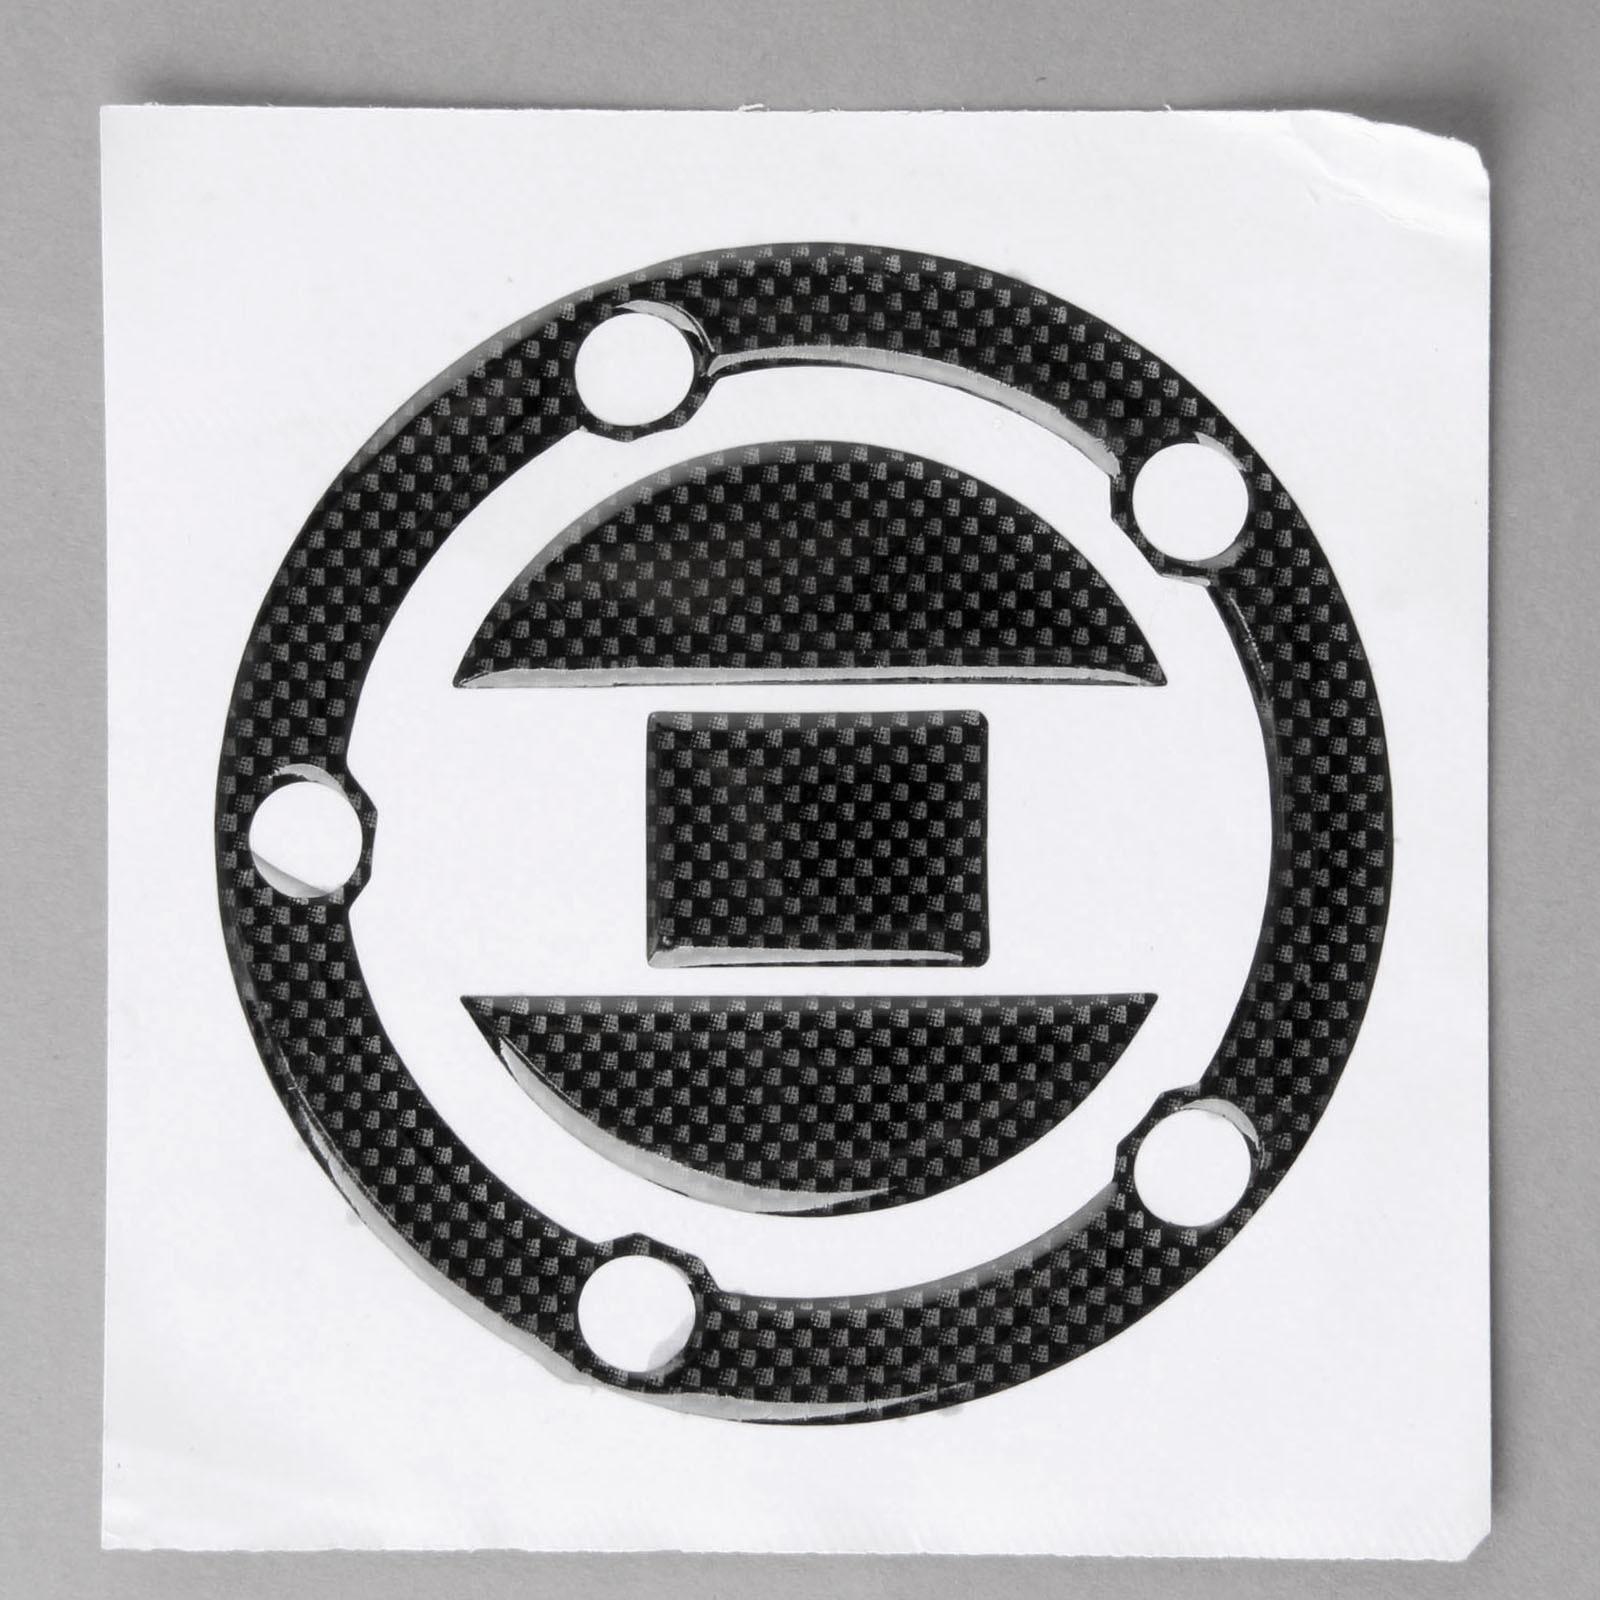 Carbon Fiber Fuel Gas Oil Cap Tank Pad Tankpad Protector Sticker For Motorcycle Universal For SUZUKI GSXR 600 GSX-R750 1000